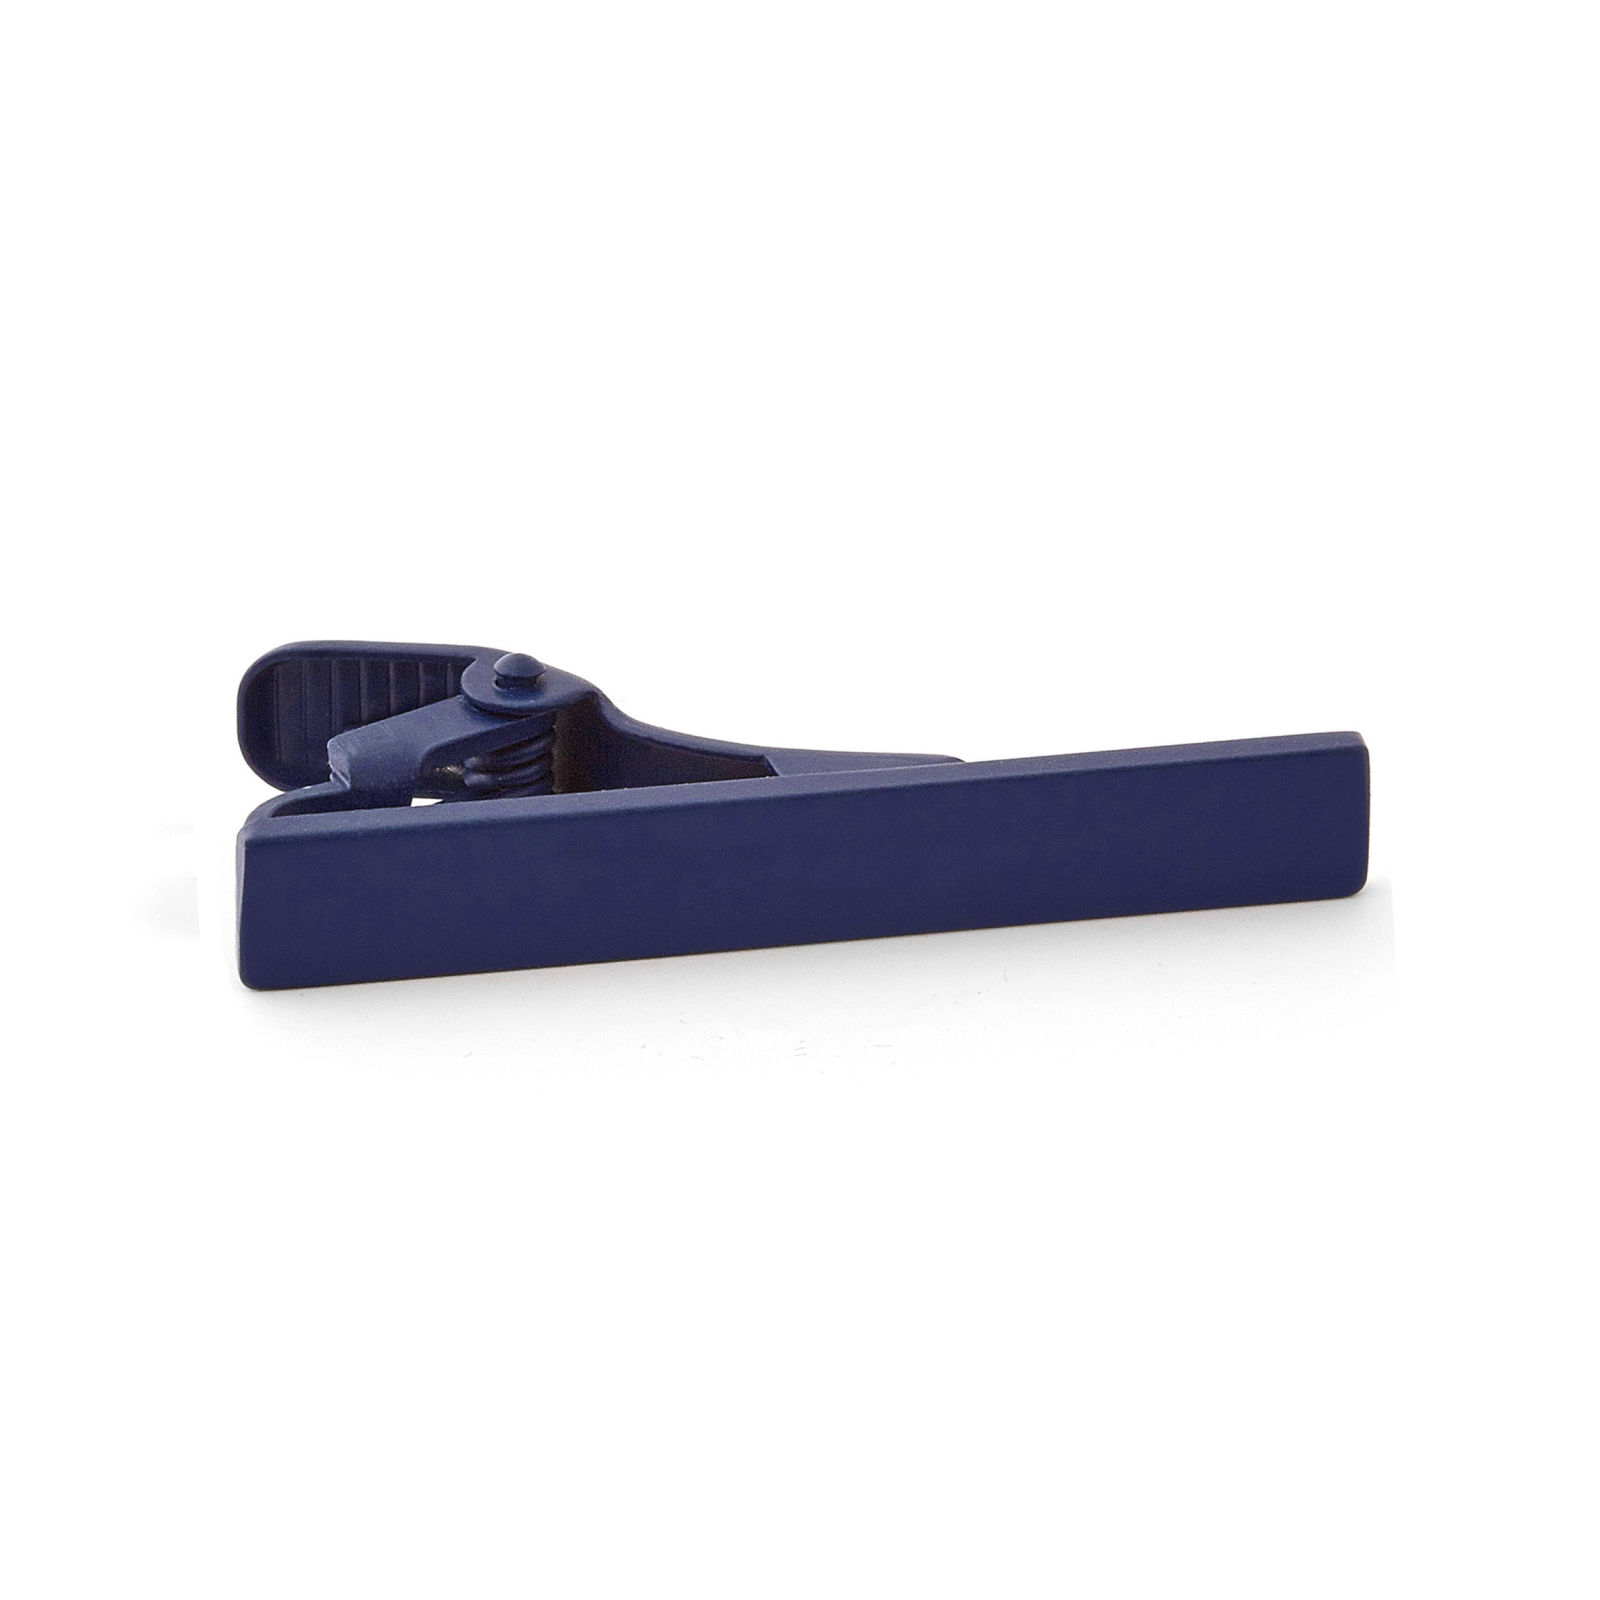 Détail Bleu De Cravate Trendhim C4gRu